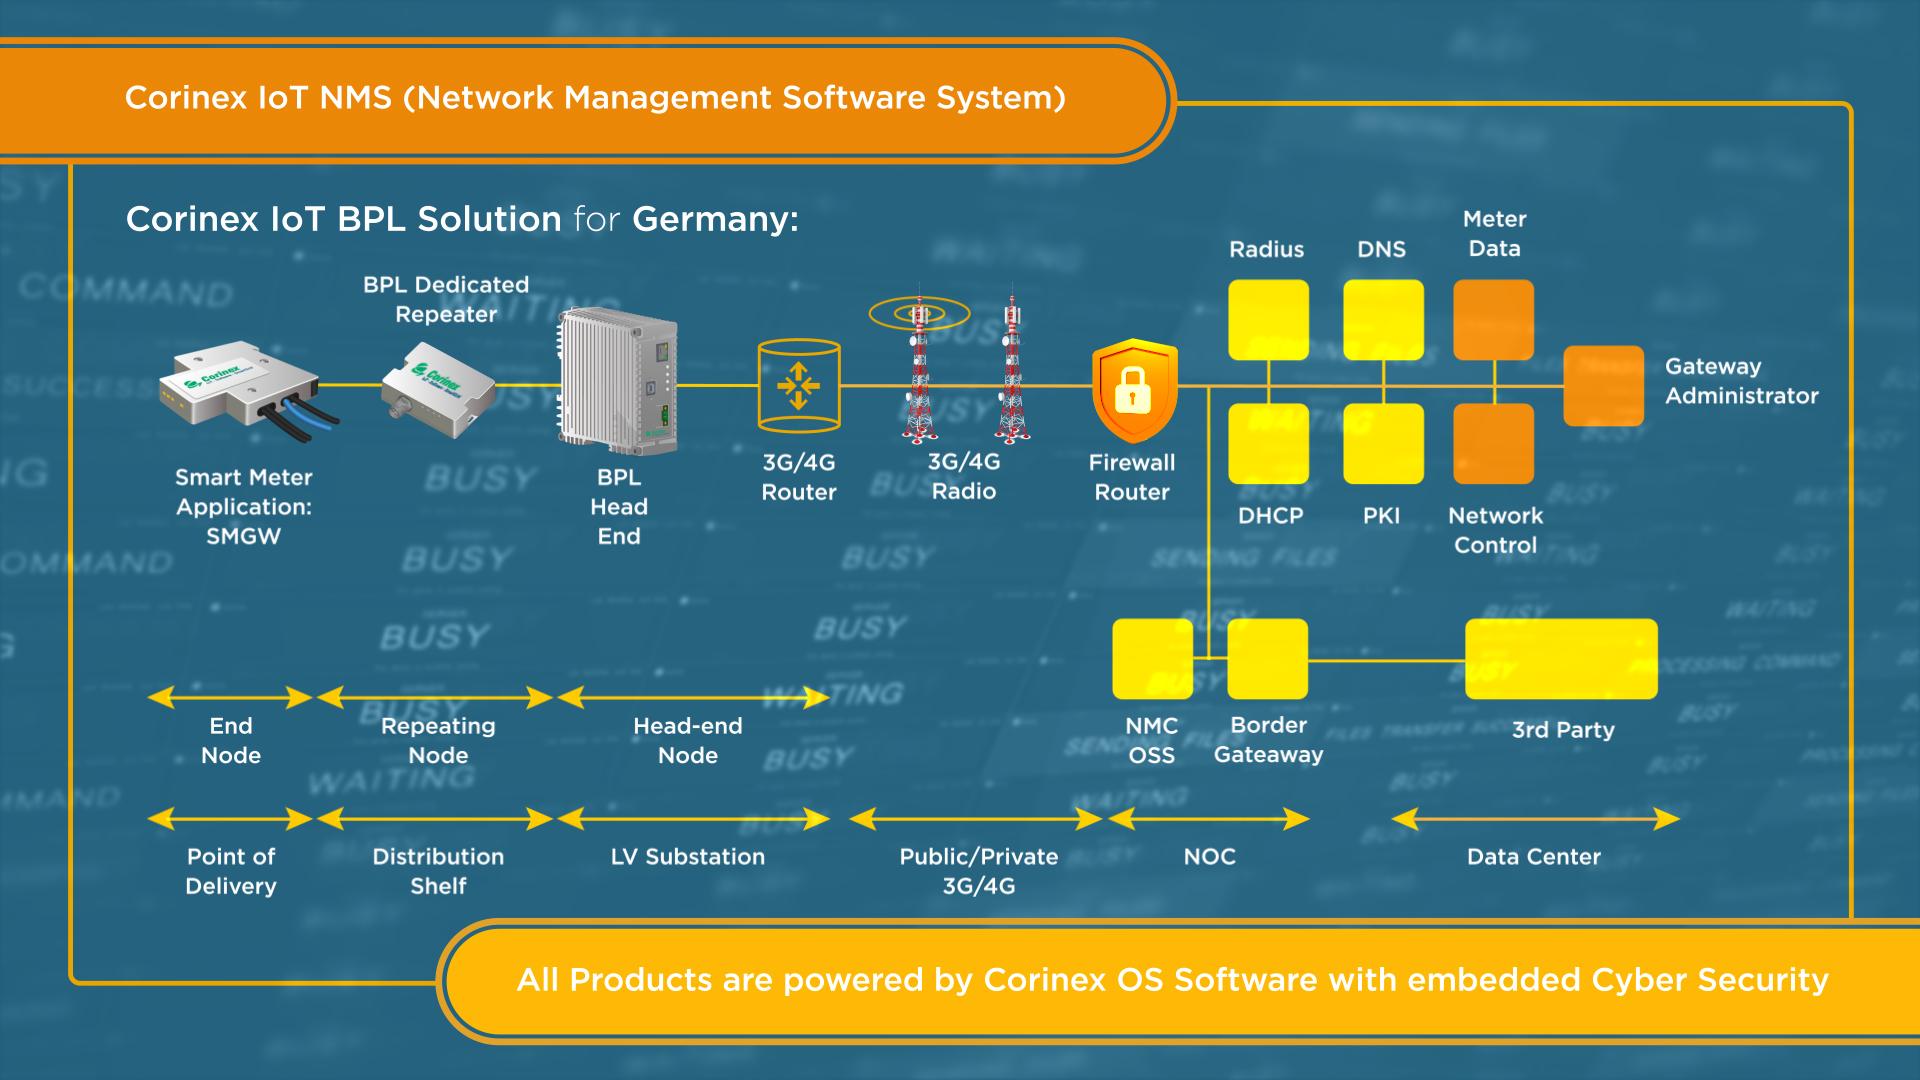 Corinex IoT BPL Solution for Germany